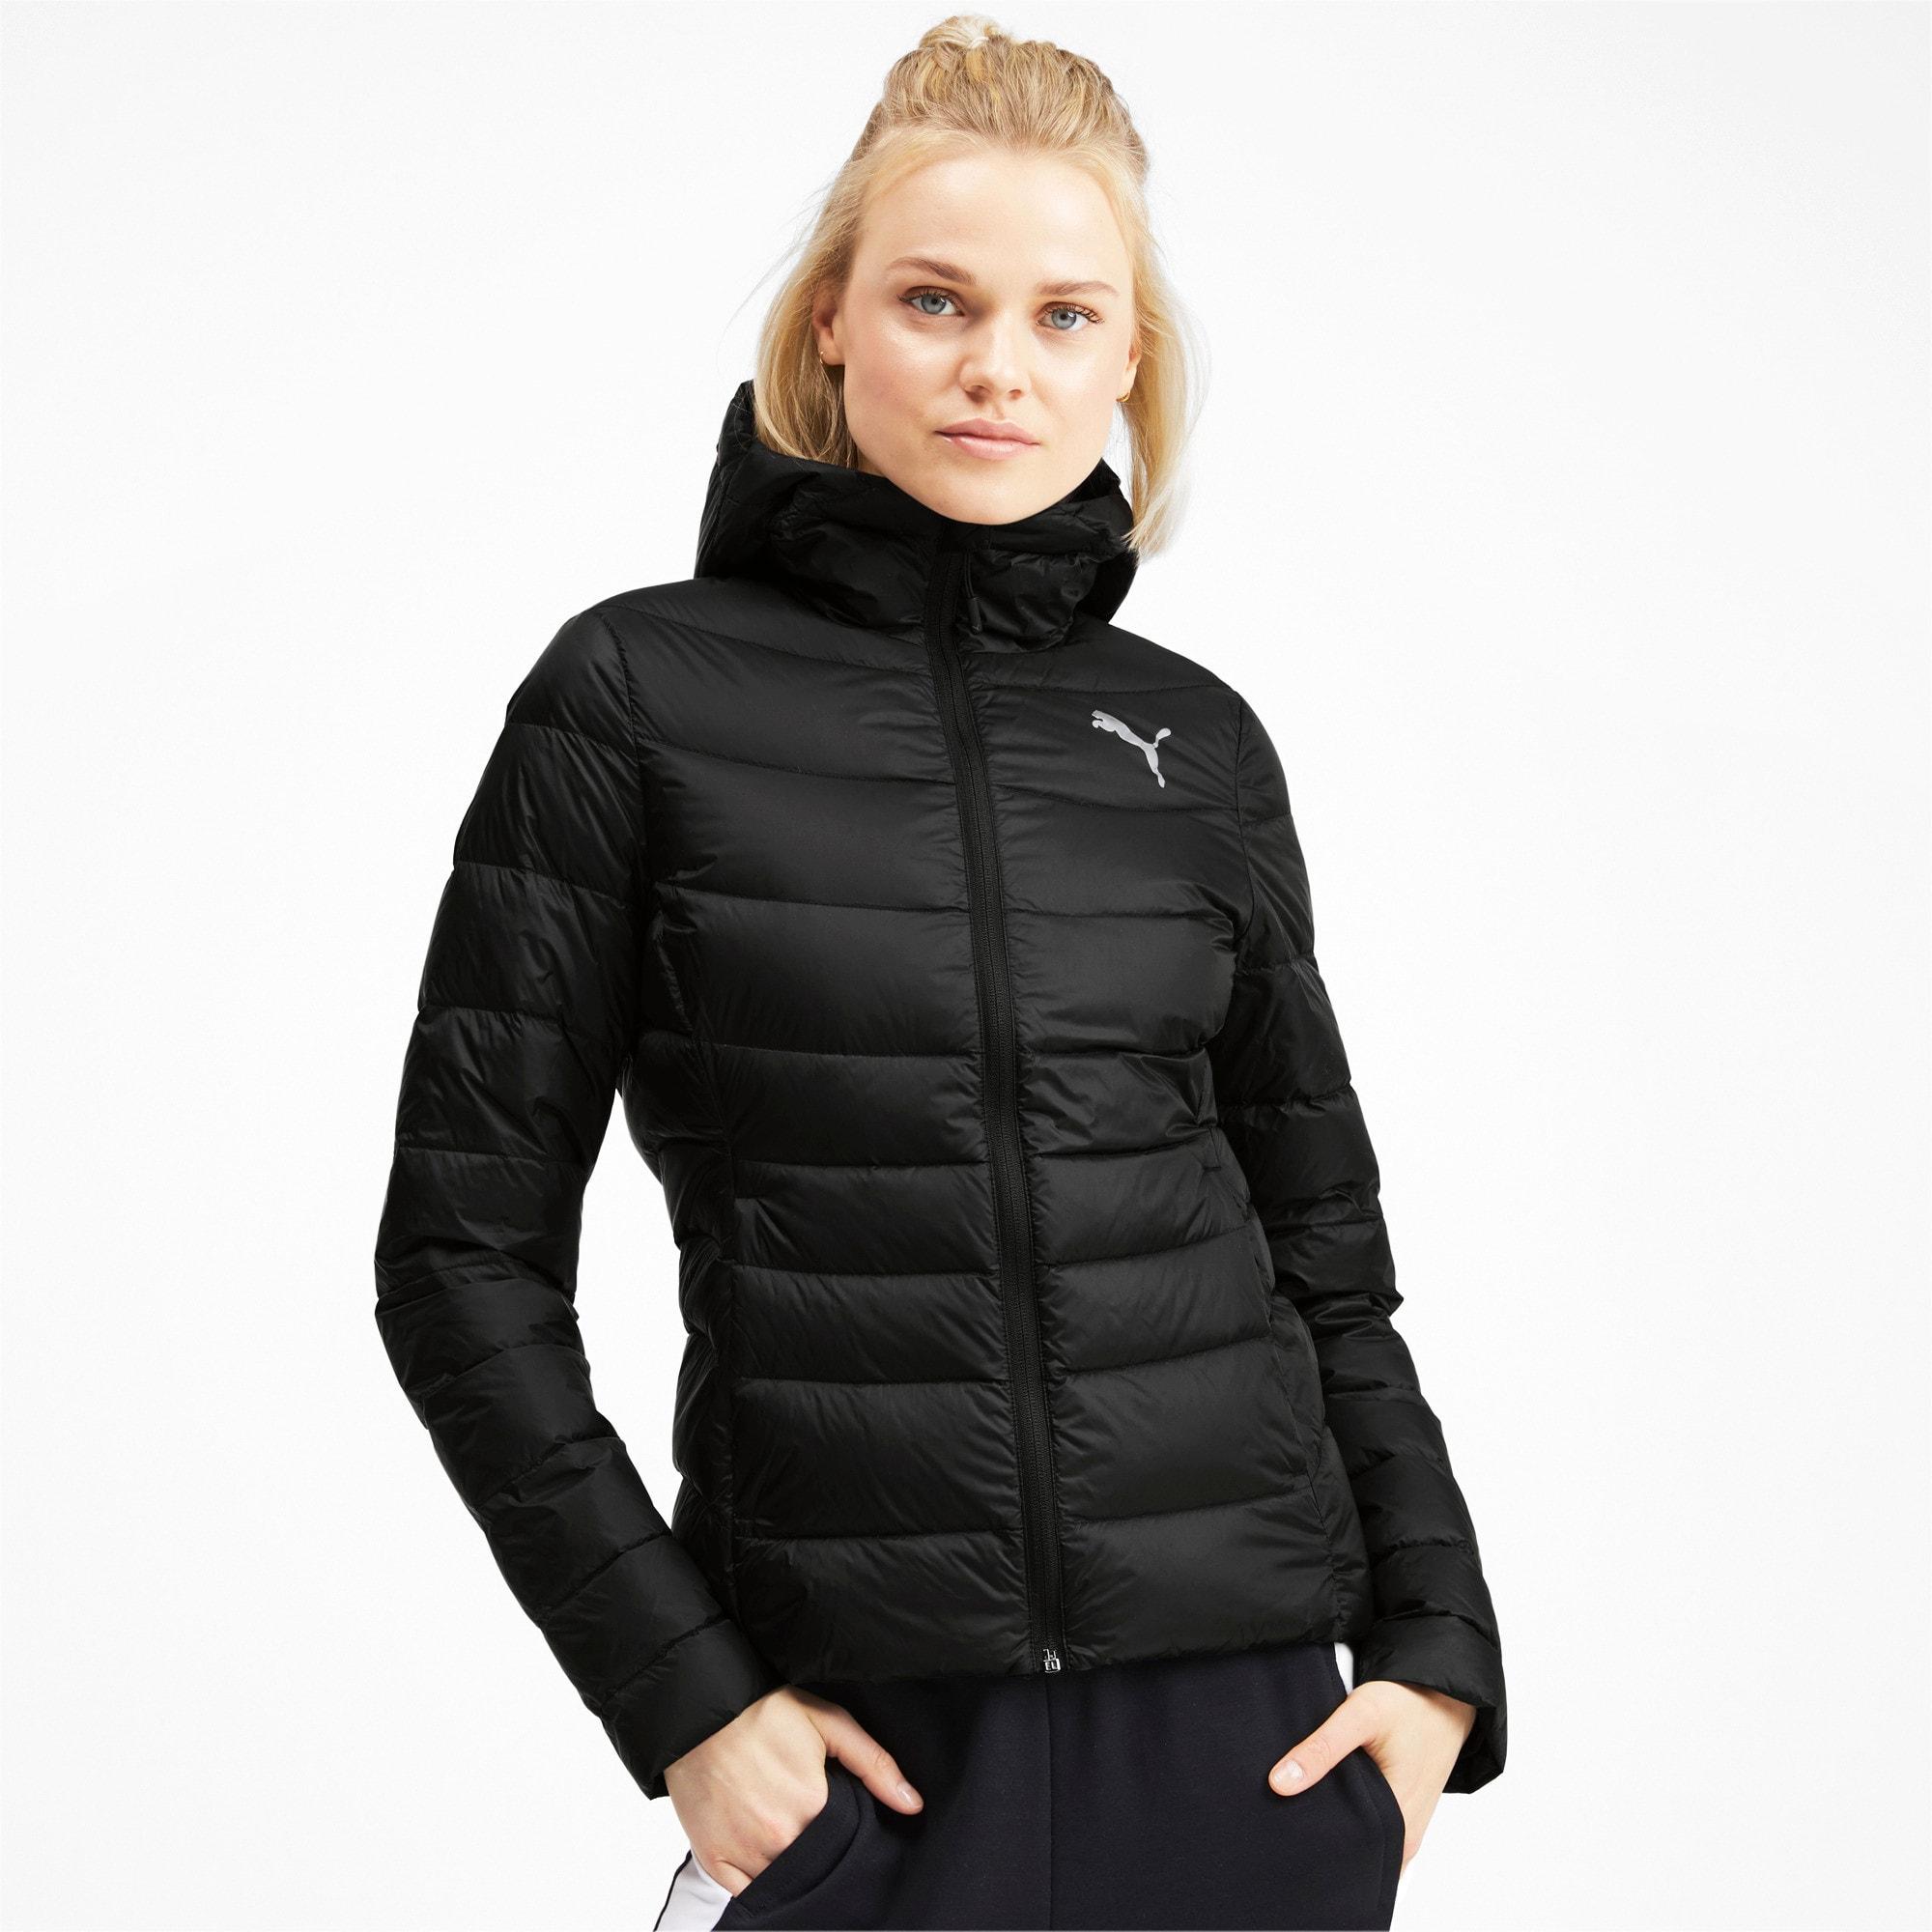 Thumbnail 1 of PWRWarm packLITE Down Women's Jacket, Puma Black, medium